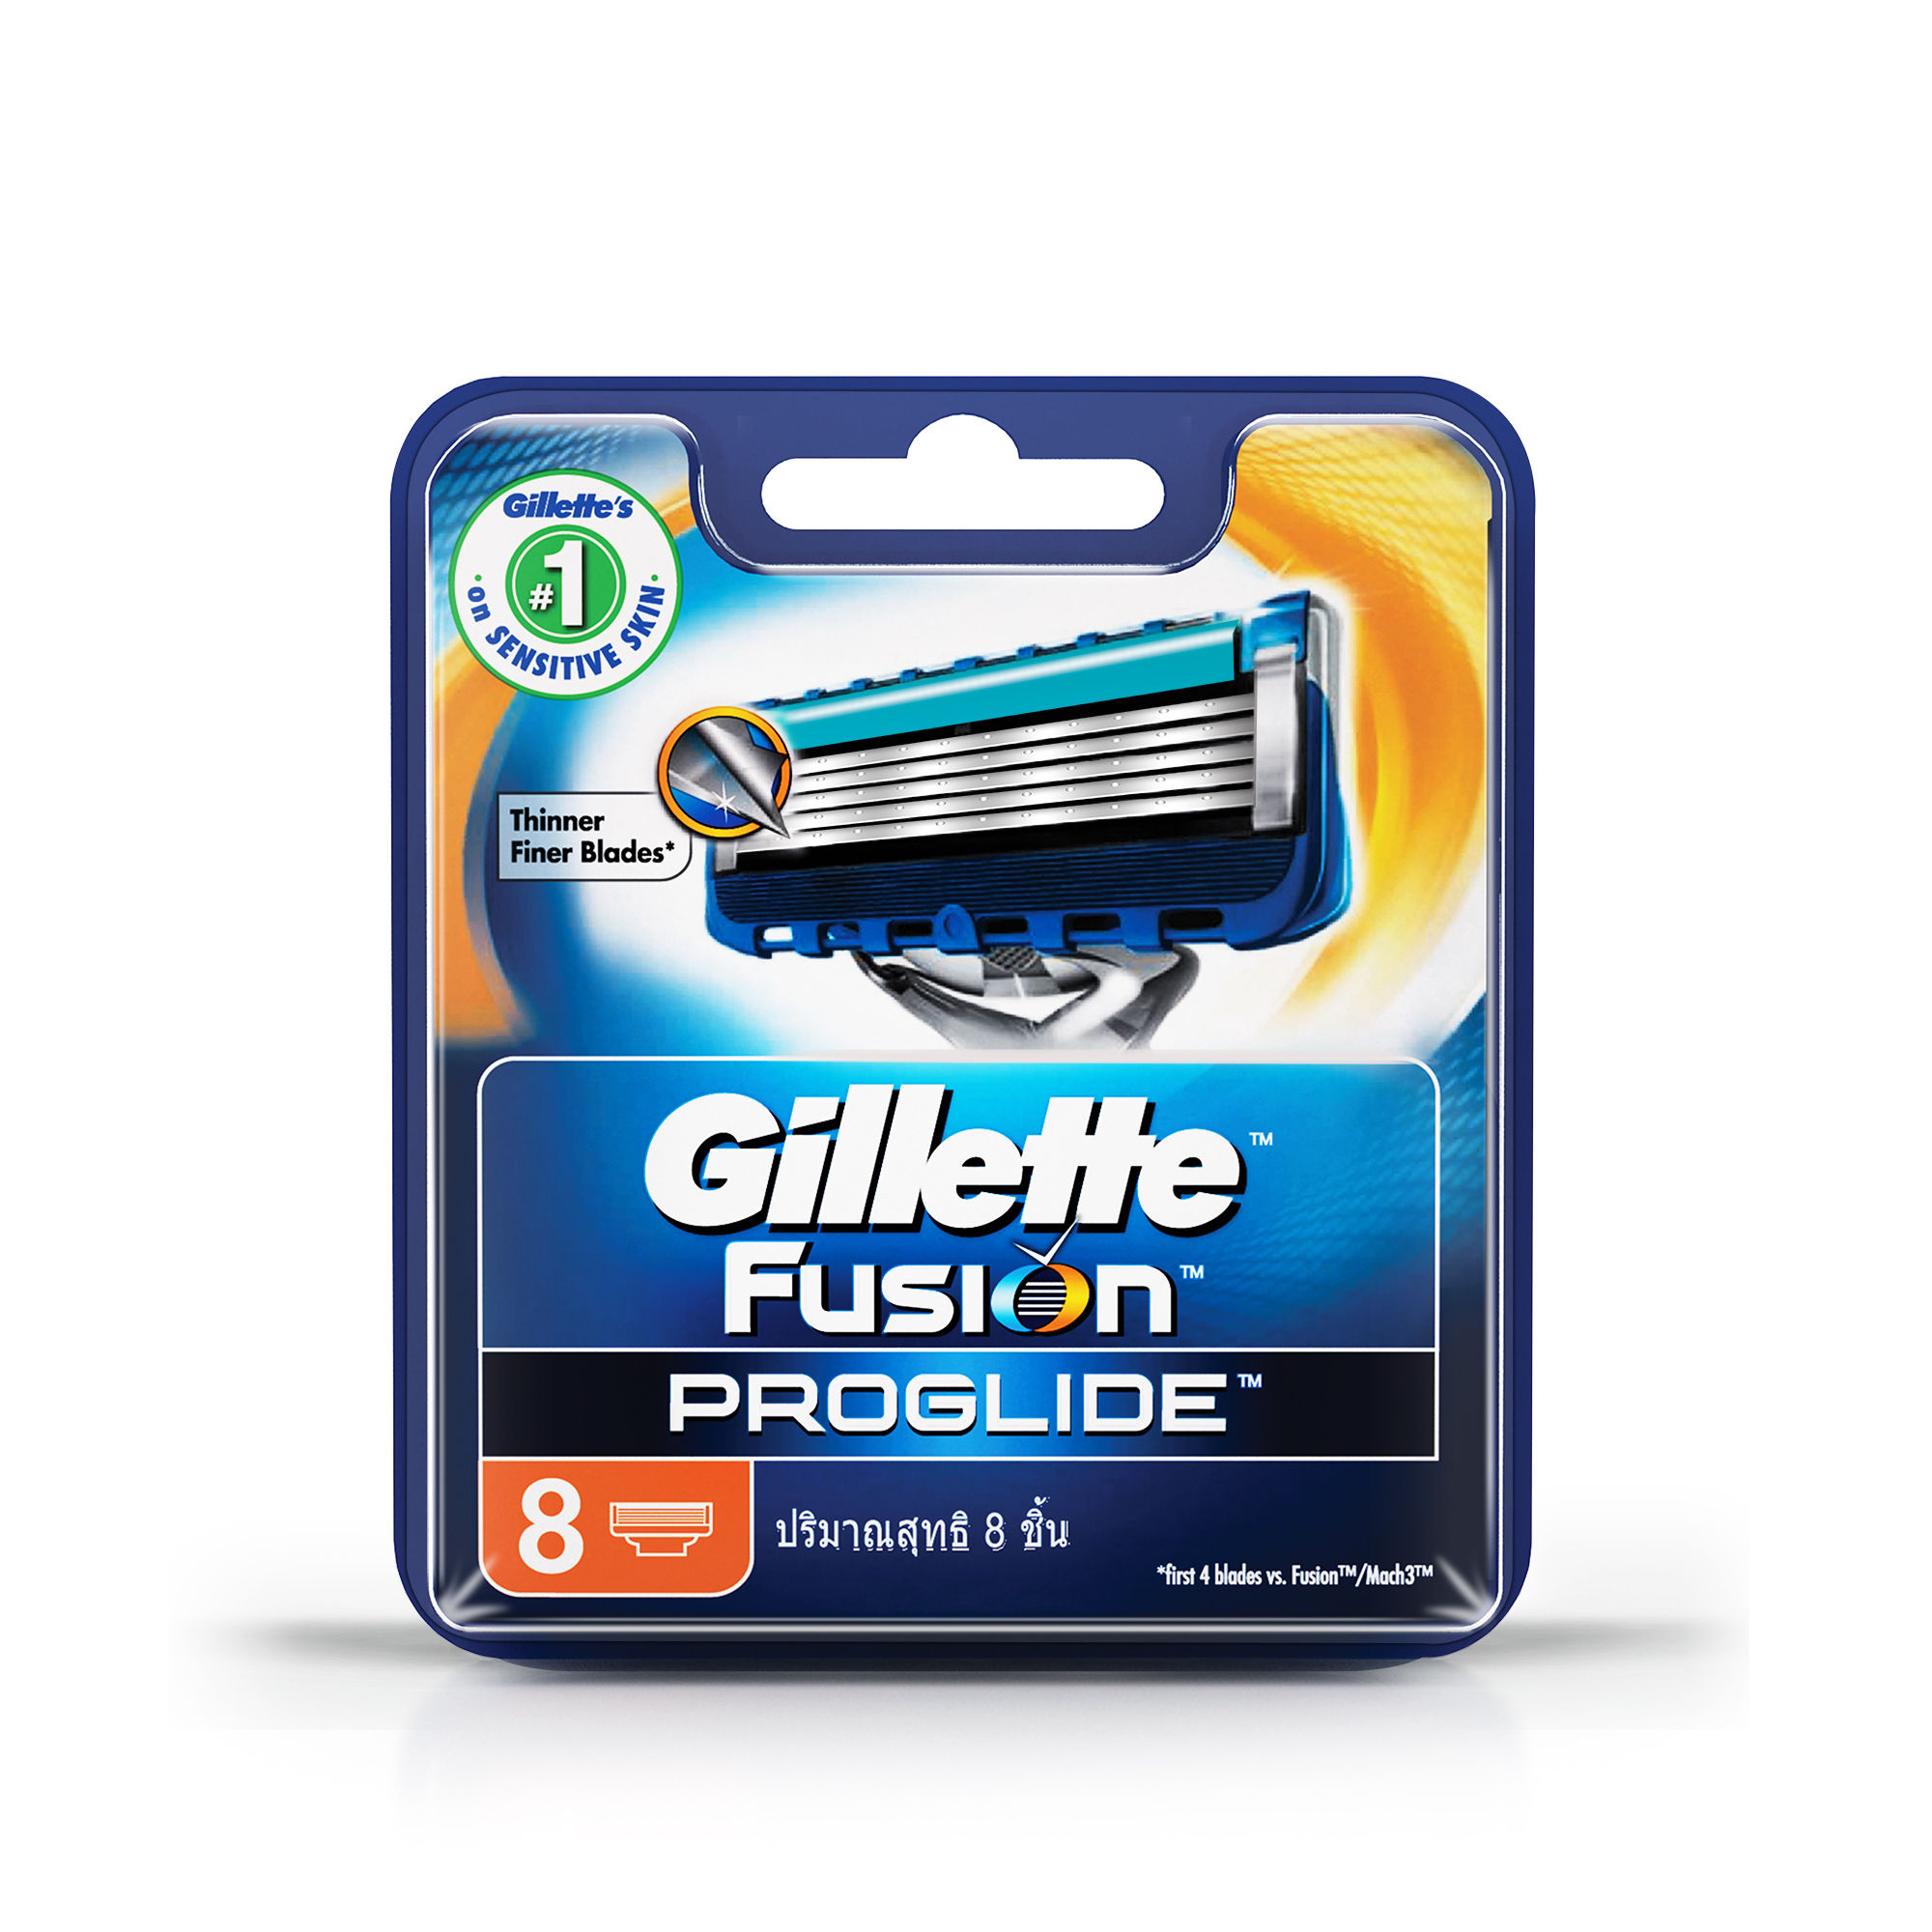 Gillette Fusion Proglide FlexBall Manual Shaving Razor Blades Cartridge  8s Pack